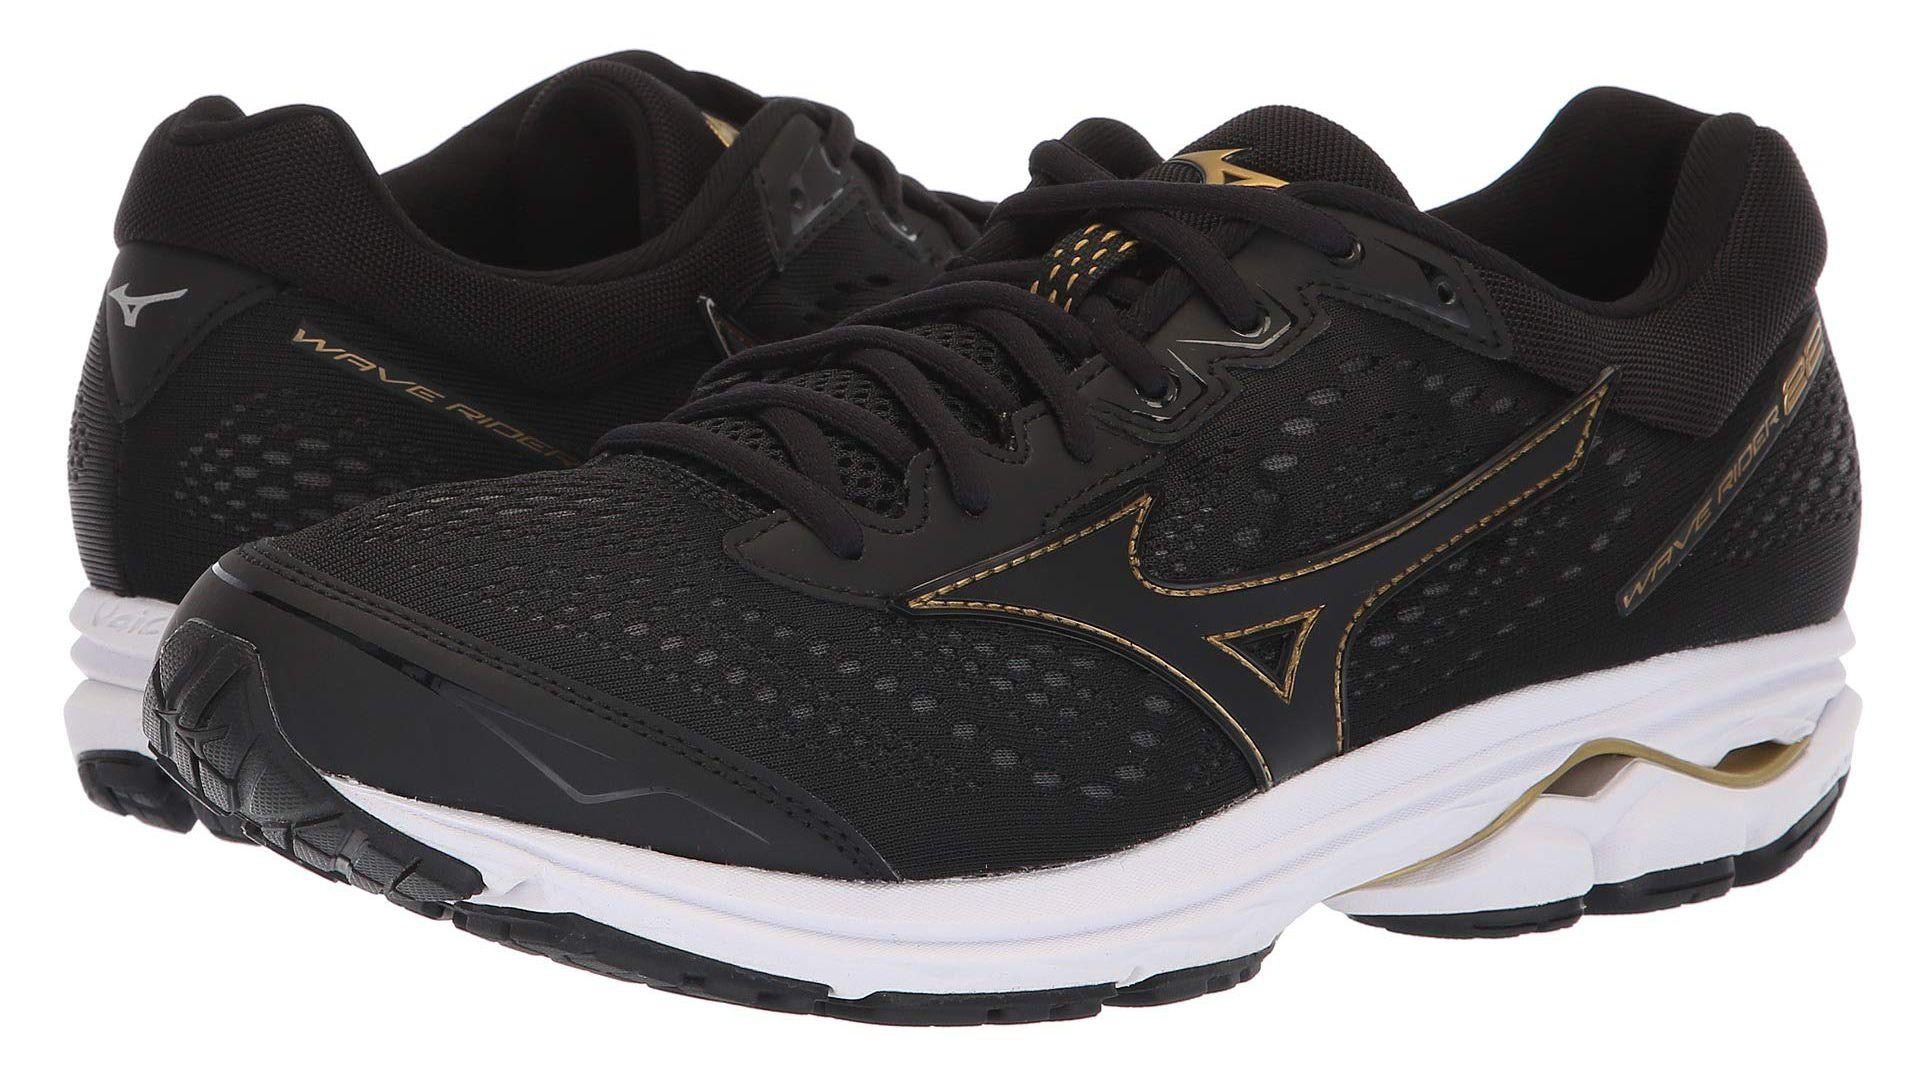 mizuno shoe size compared to new balance men's